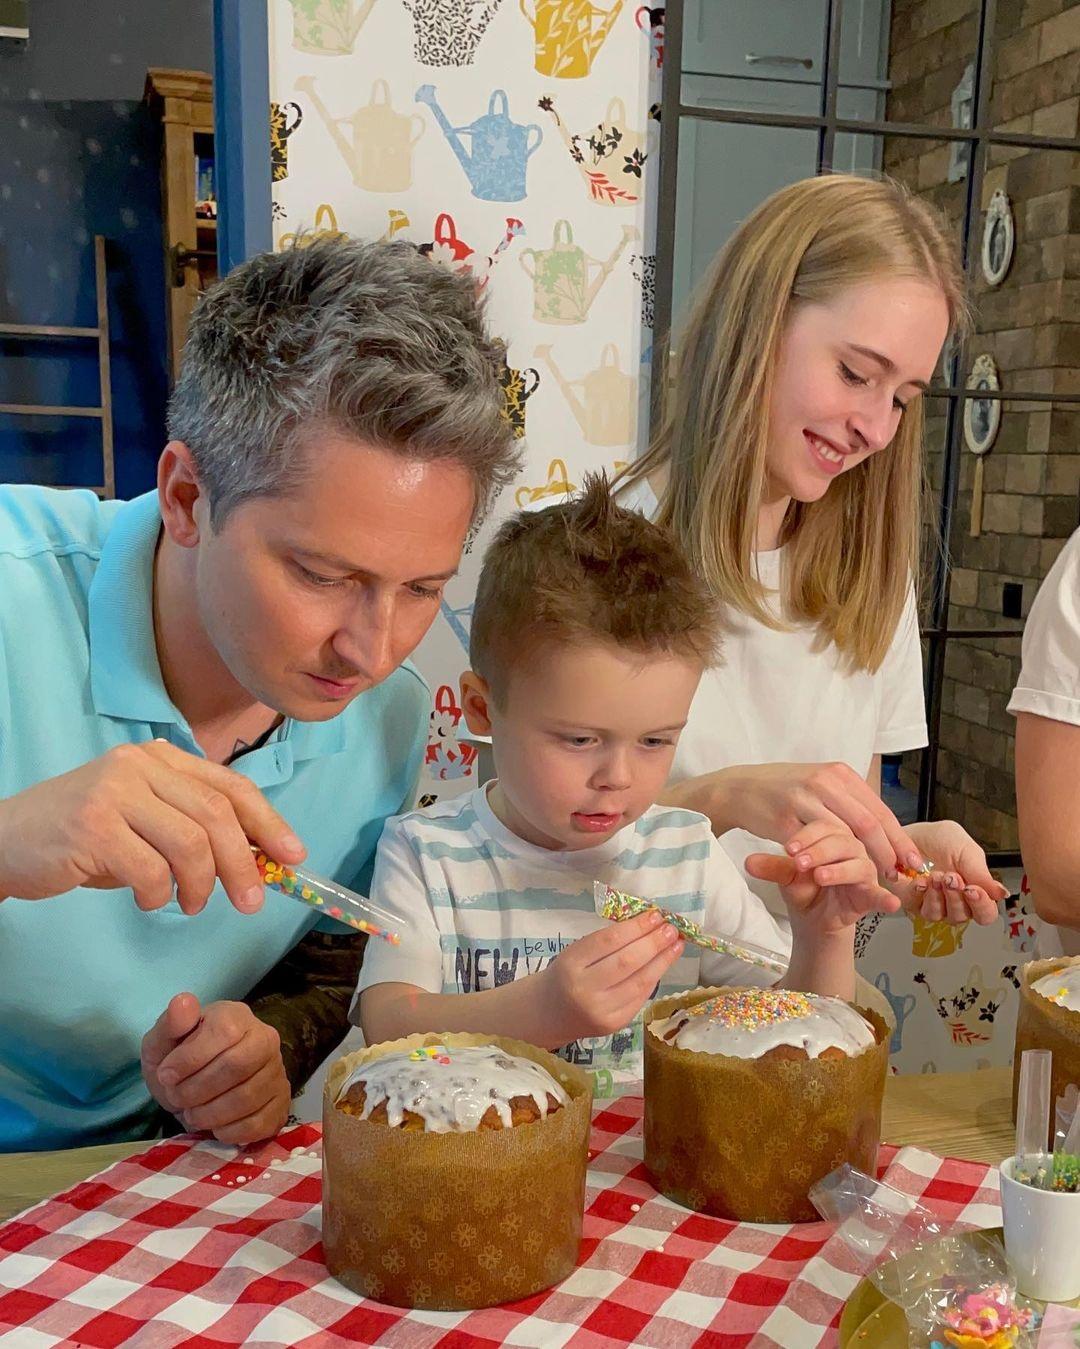 украинские звезды пасха 2021 как отметили паски крашанки декор александр педан дети